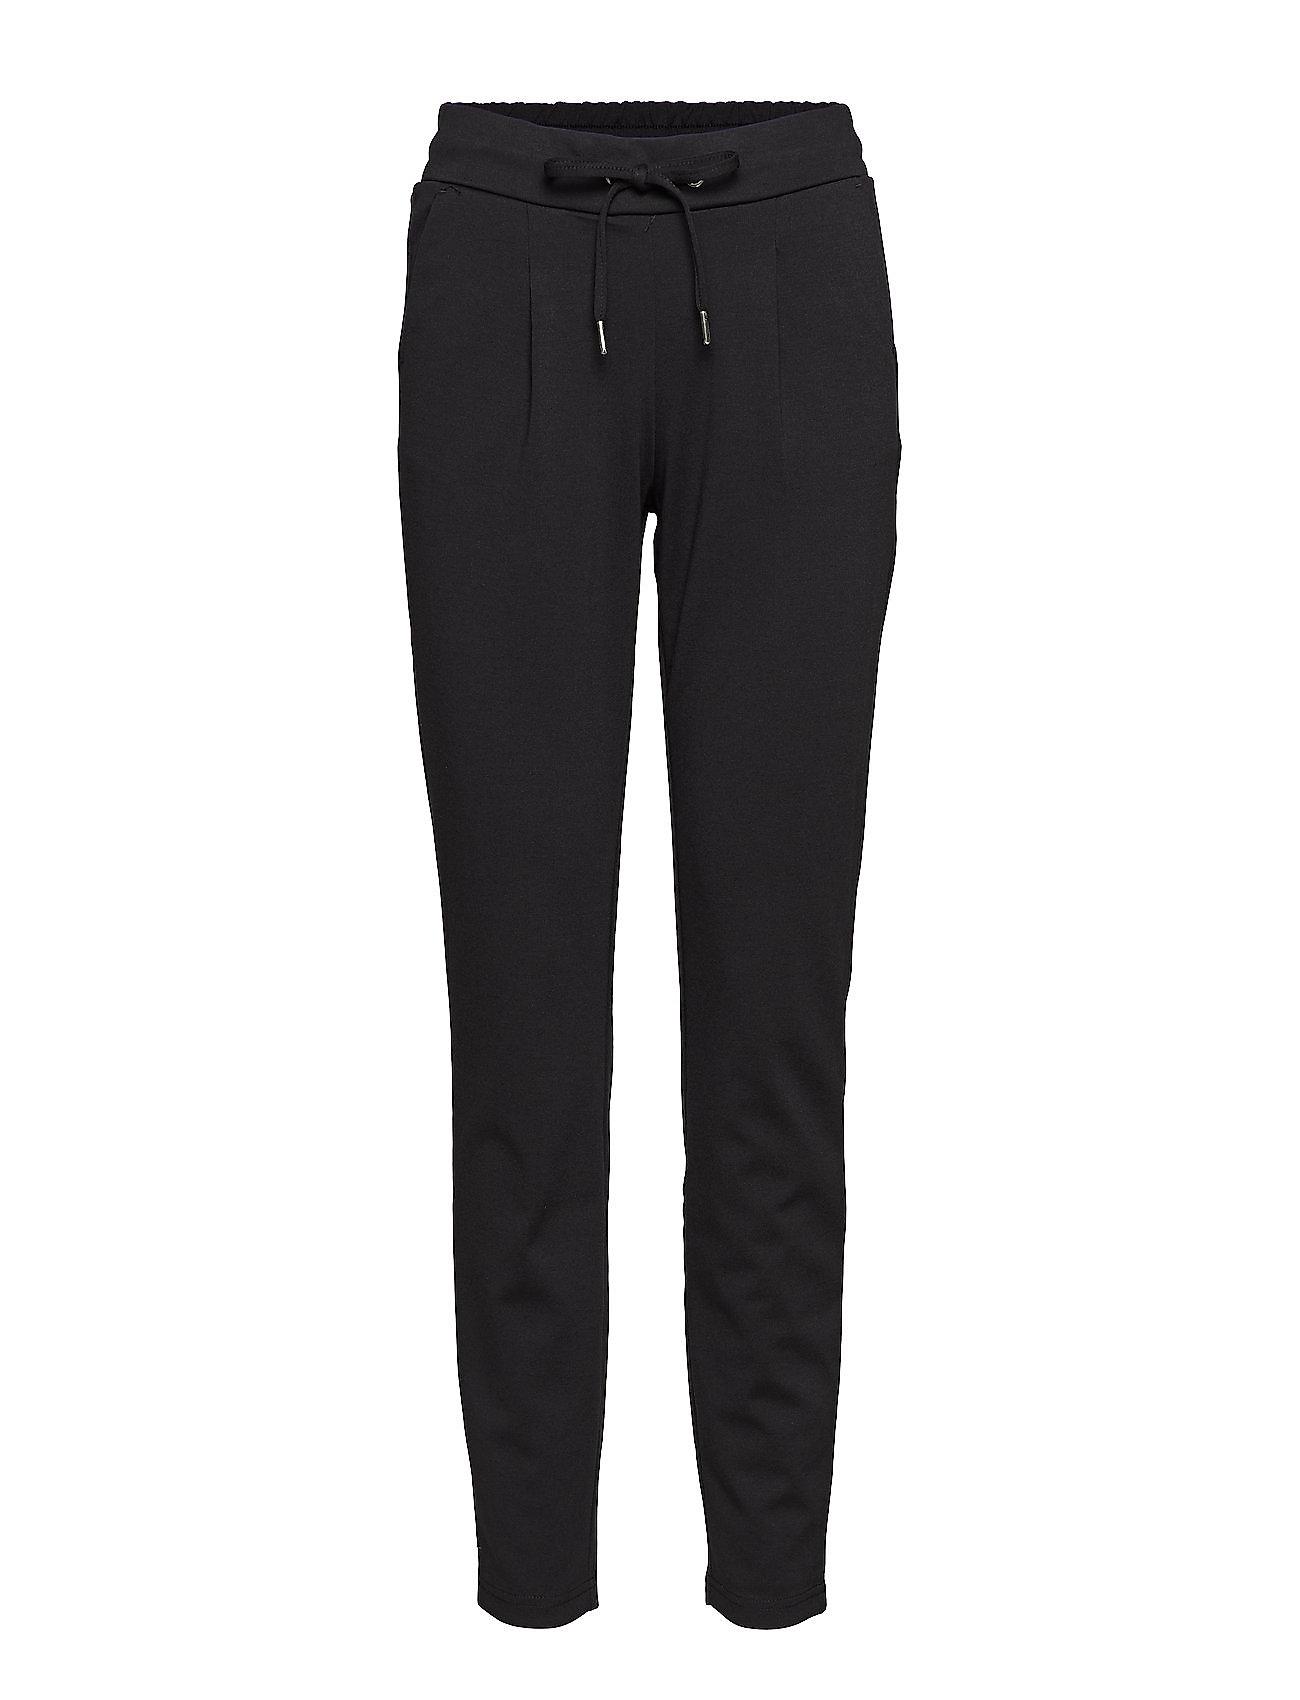 b.young Rizetta pants 2 - - BLACK